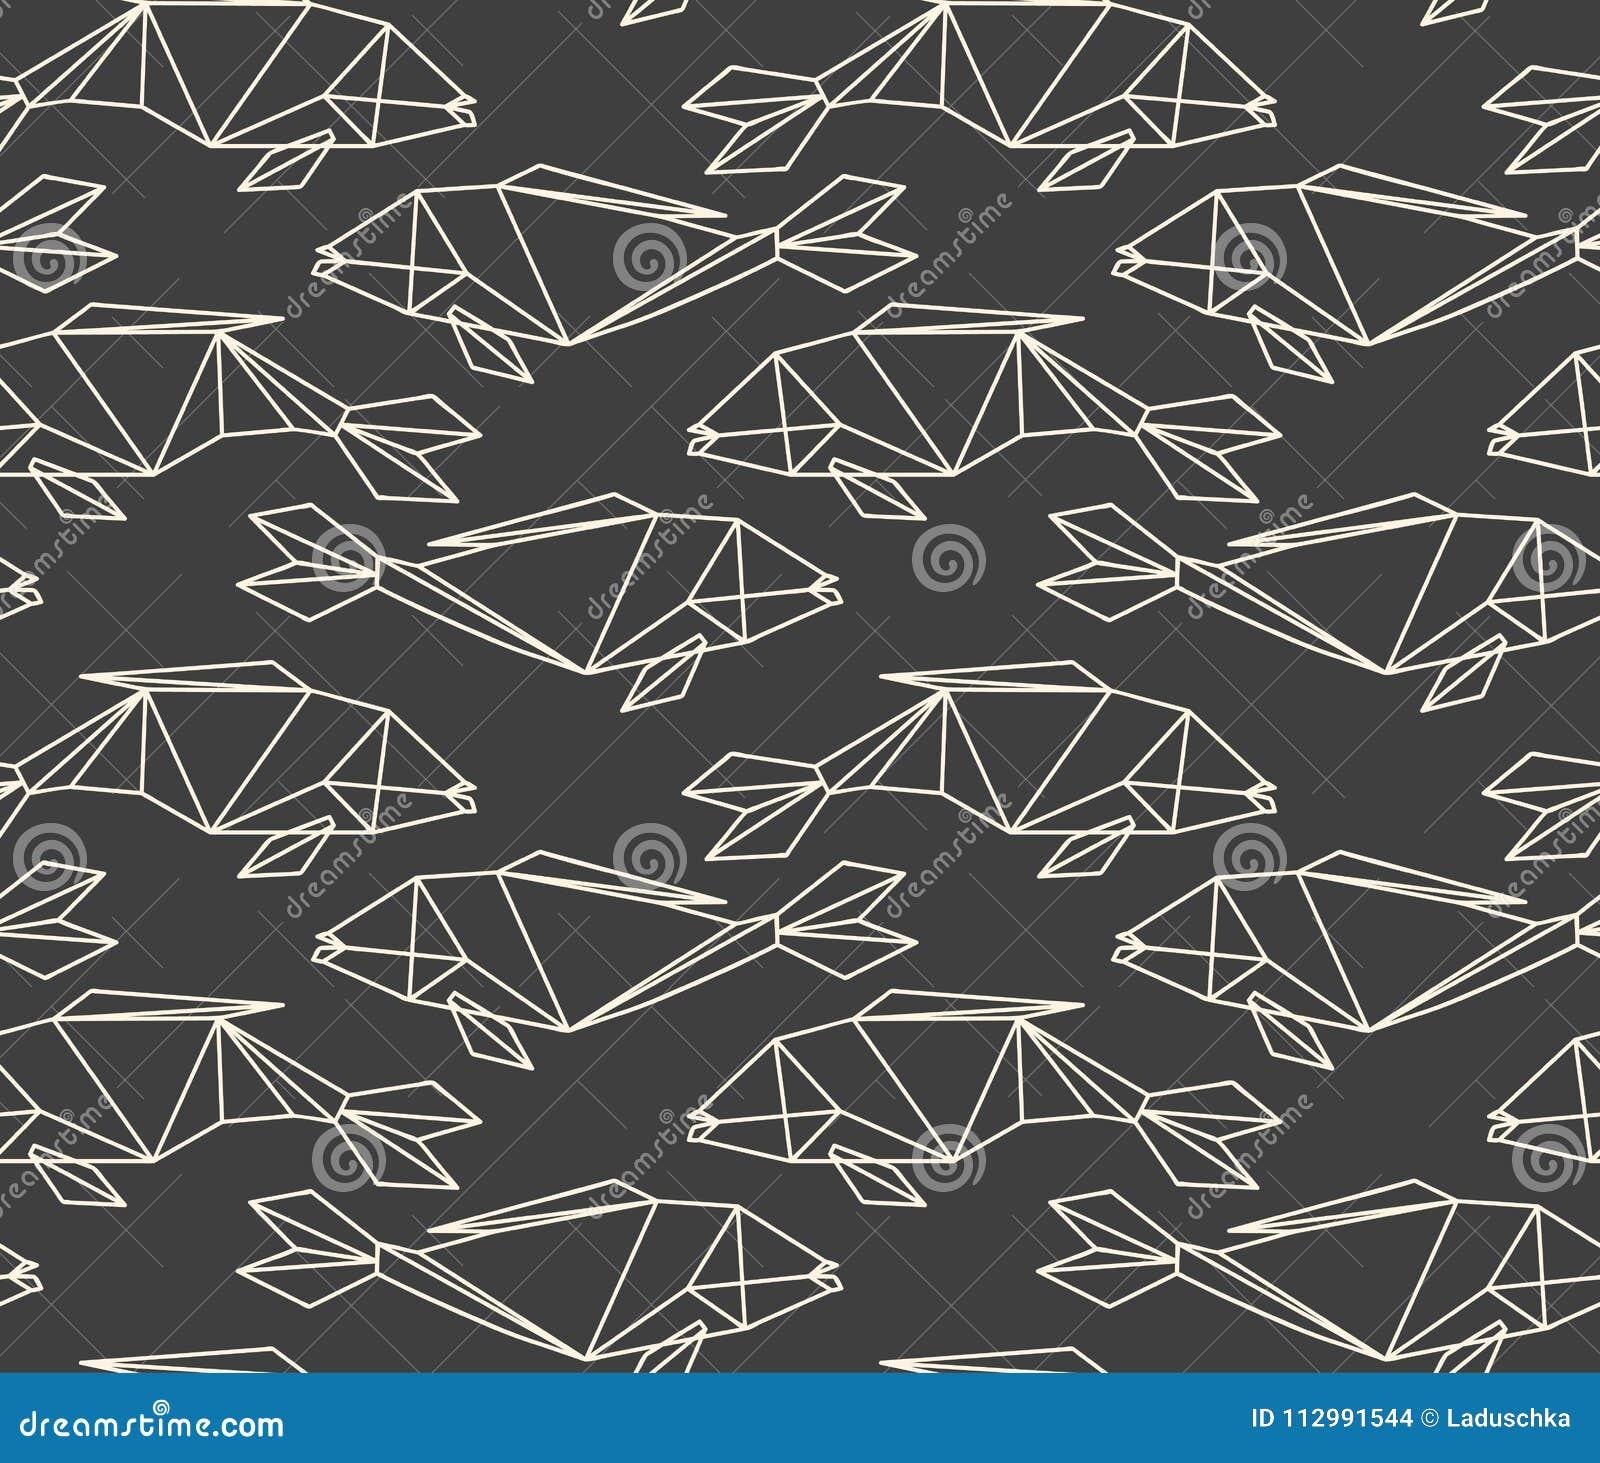 Seamless linear polygon fish pattern